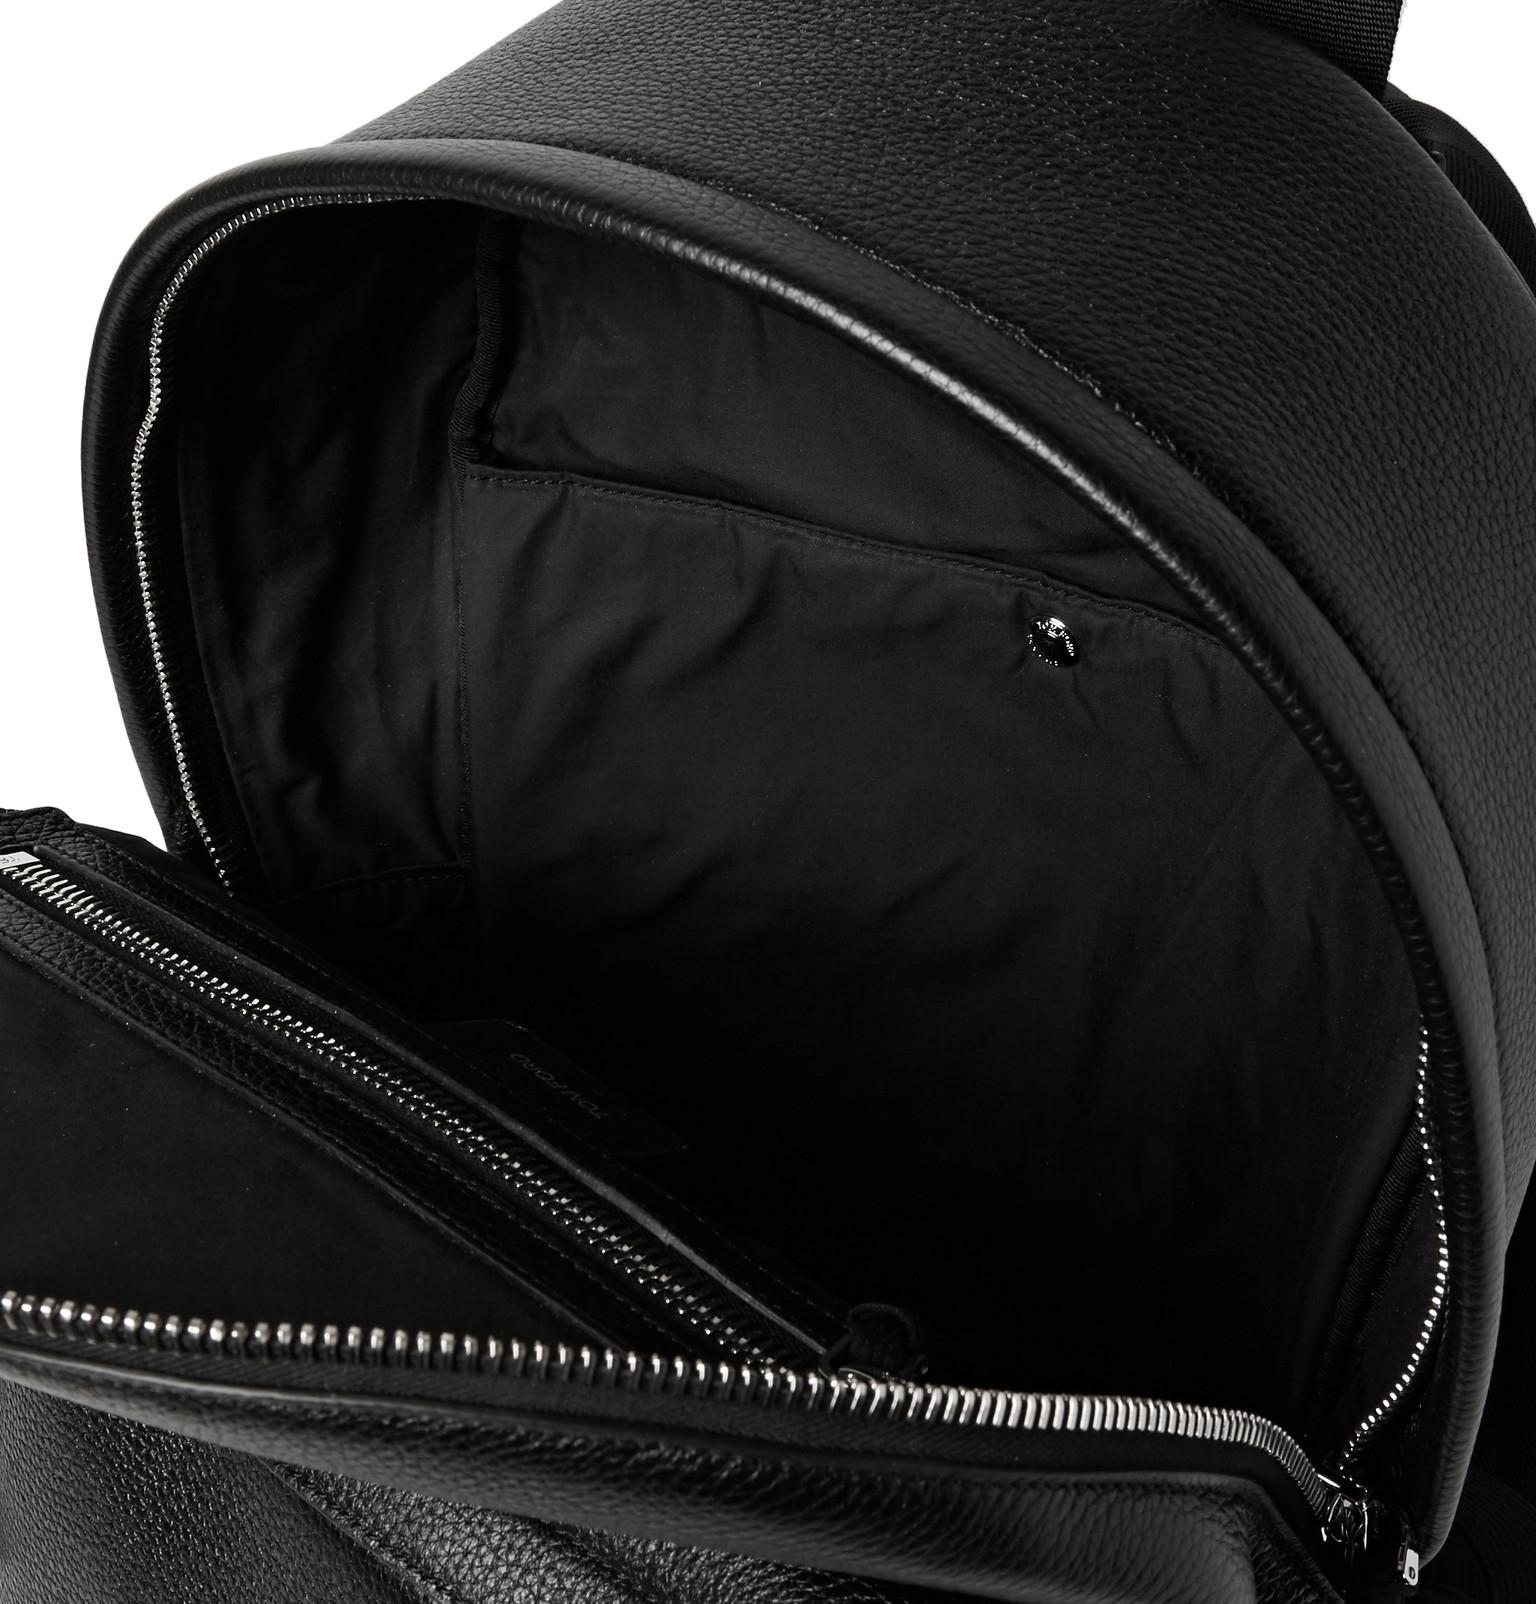 lyst tom ford suede panelled full grain leather backpack. Black Bedroom Furniture Sets. Home Design Ideas